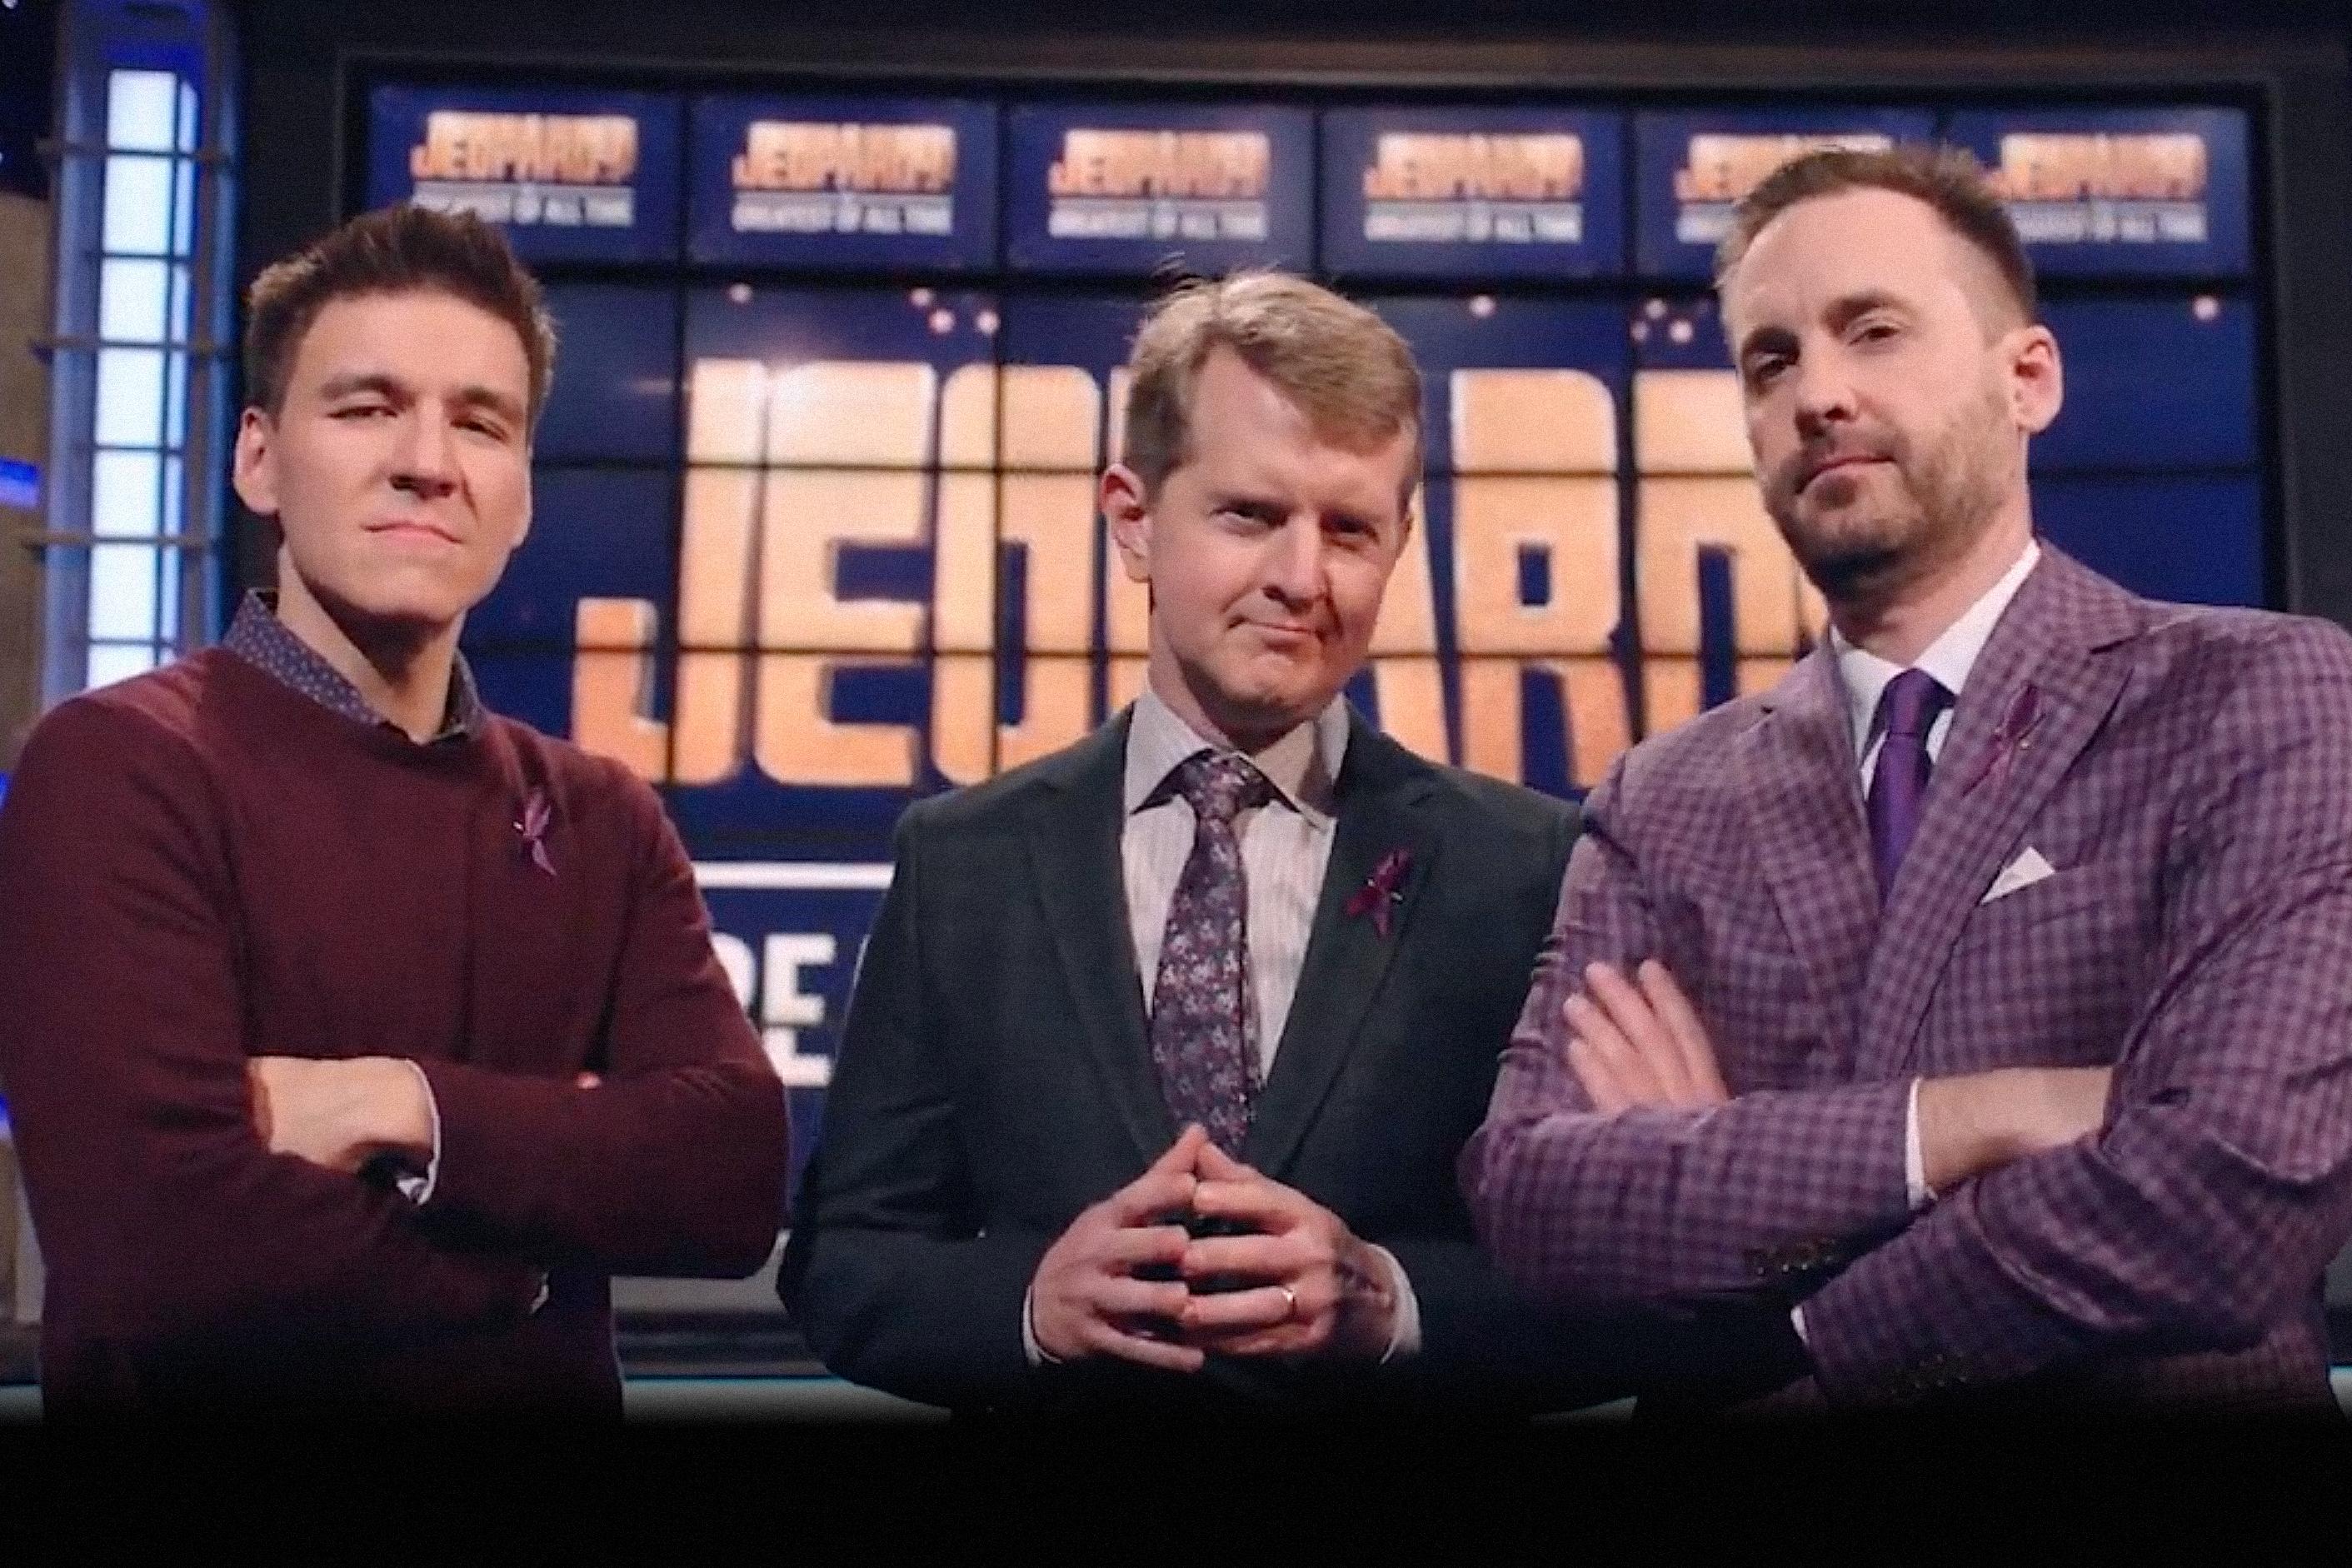 Jeopardy! ABC Ken Jennings Alex Trebek James Holzhauer Brad Rutter Sony Pictures TV